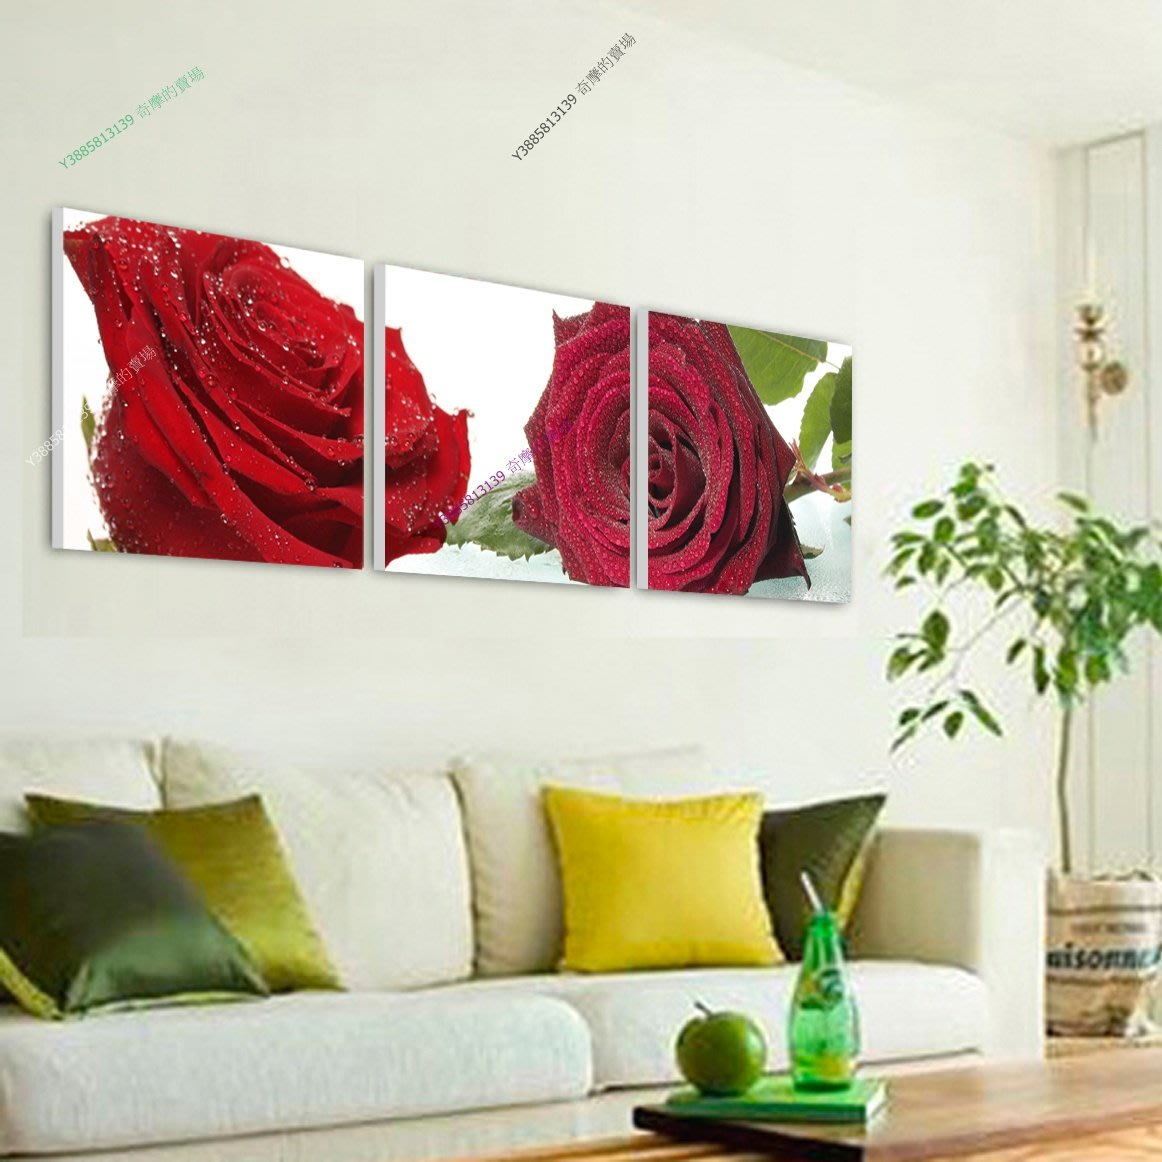 【60*60cm】【厚0.9cm】耀眼玫瑰-無框畫裝飾畫版畫客廳簡約家居餐廳臥室牆壁【280101_076】(1套價格)